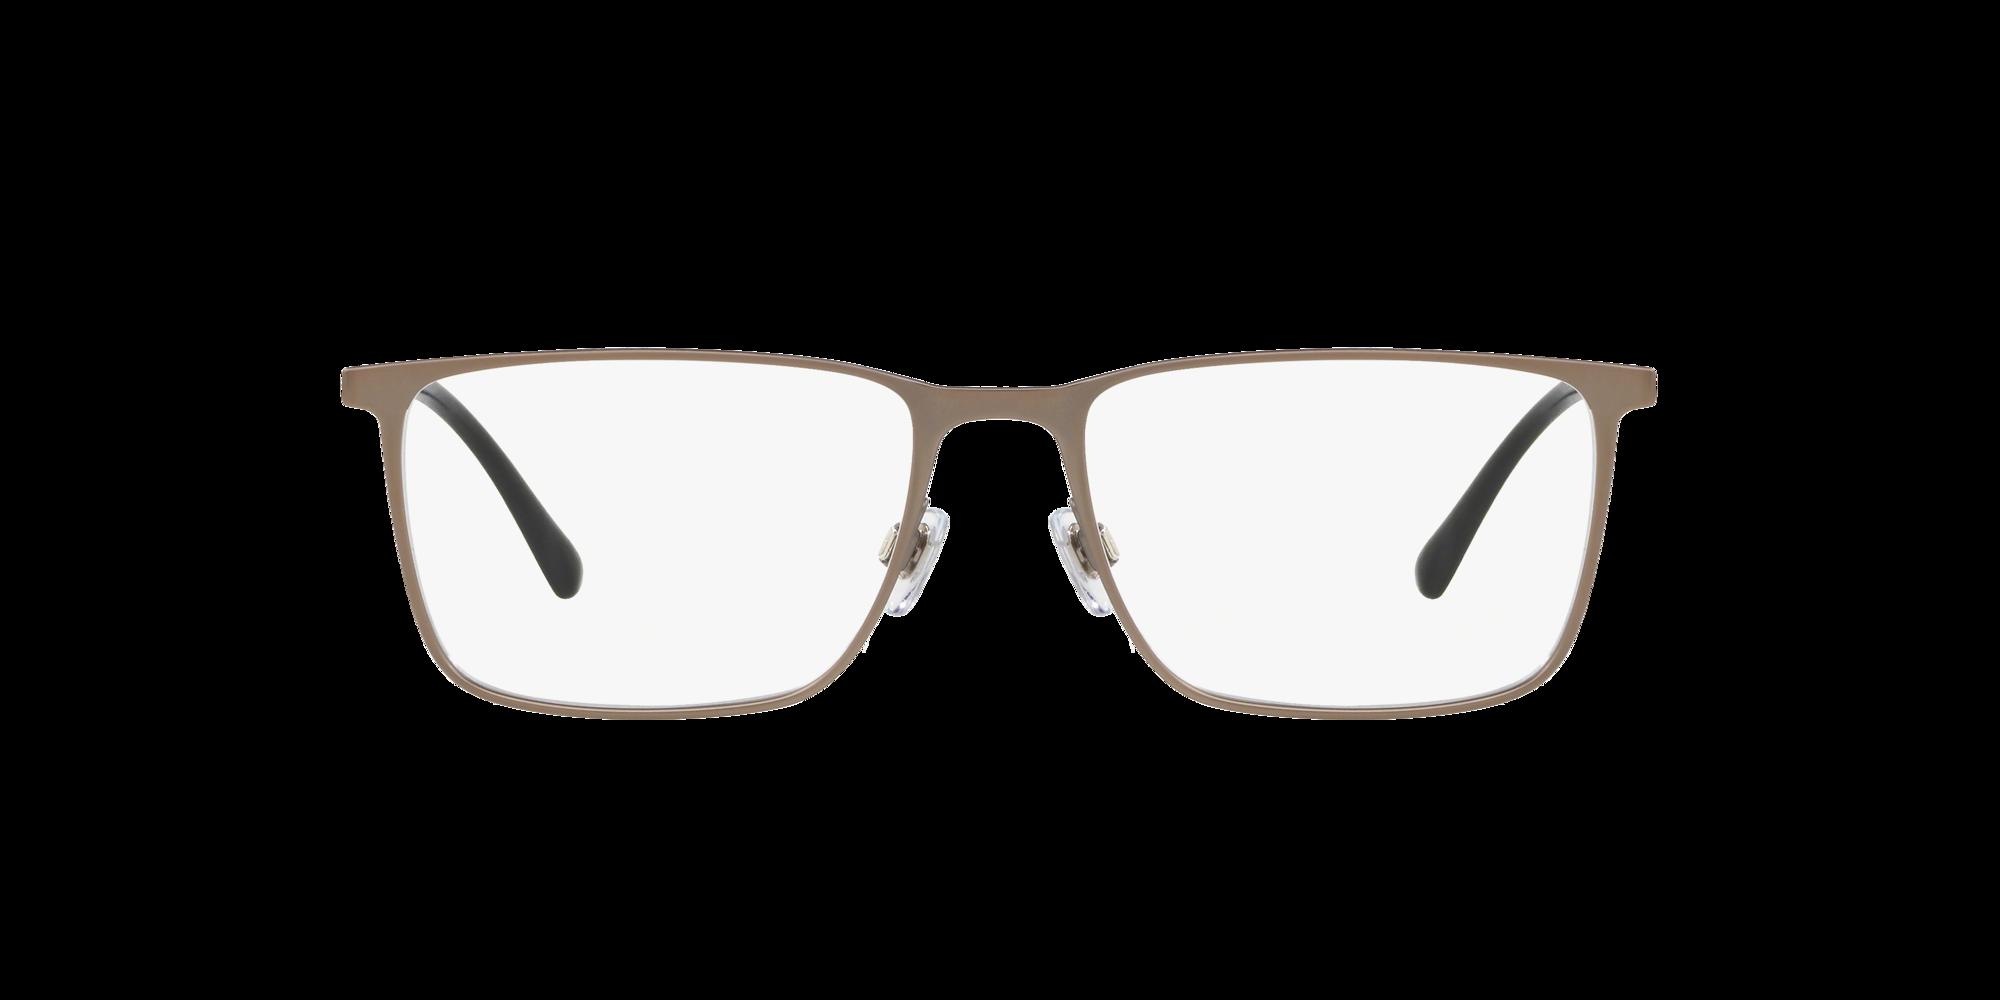 Image for AR5080 from LensCrafters | Glasses, Prescription Glasses Online, Eyewear